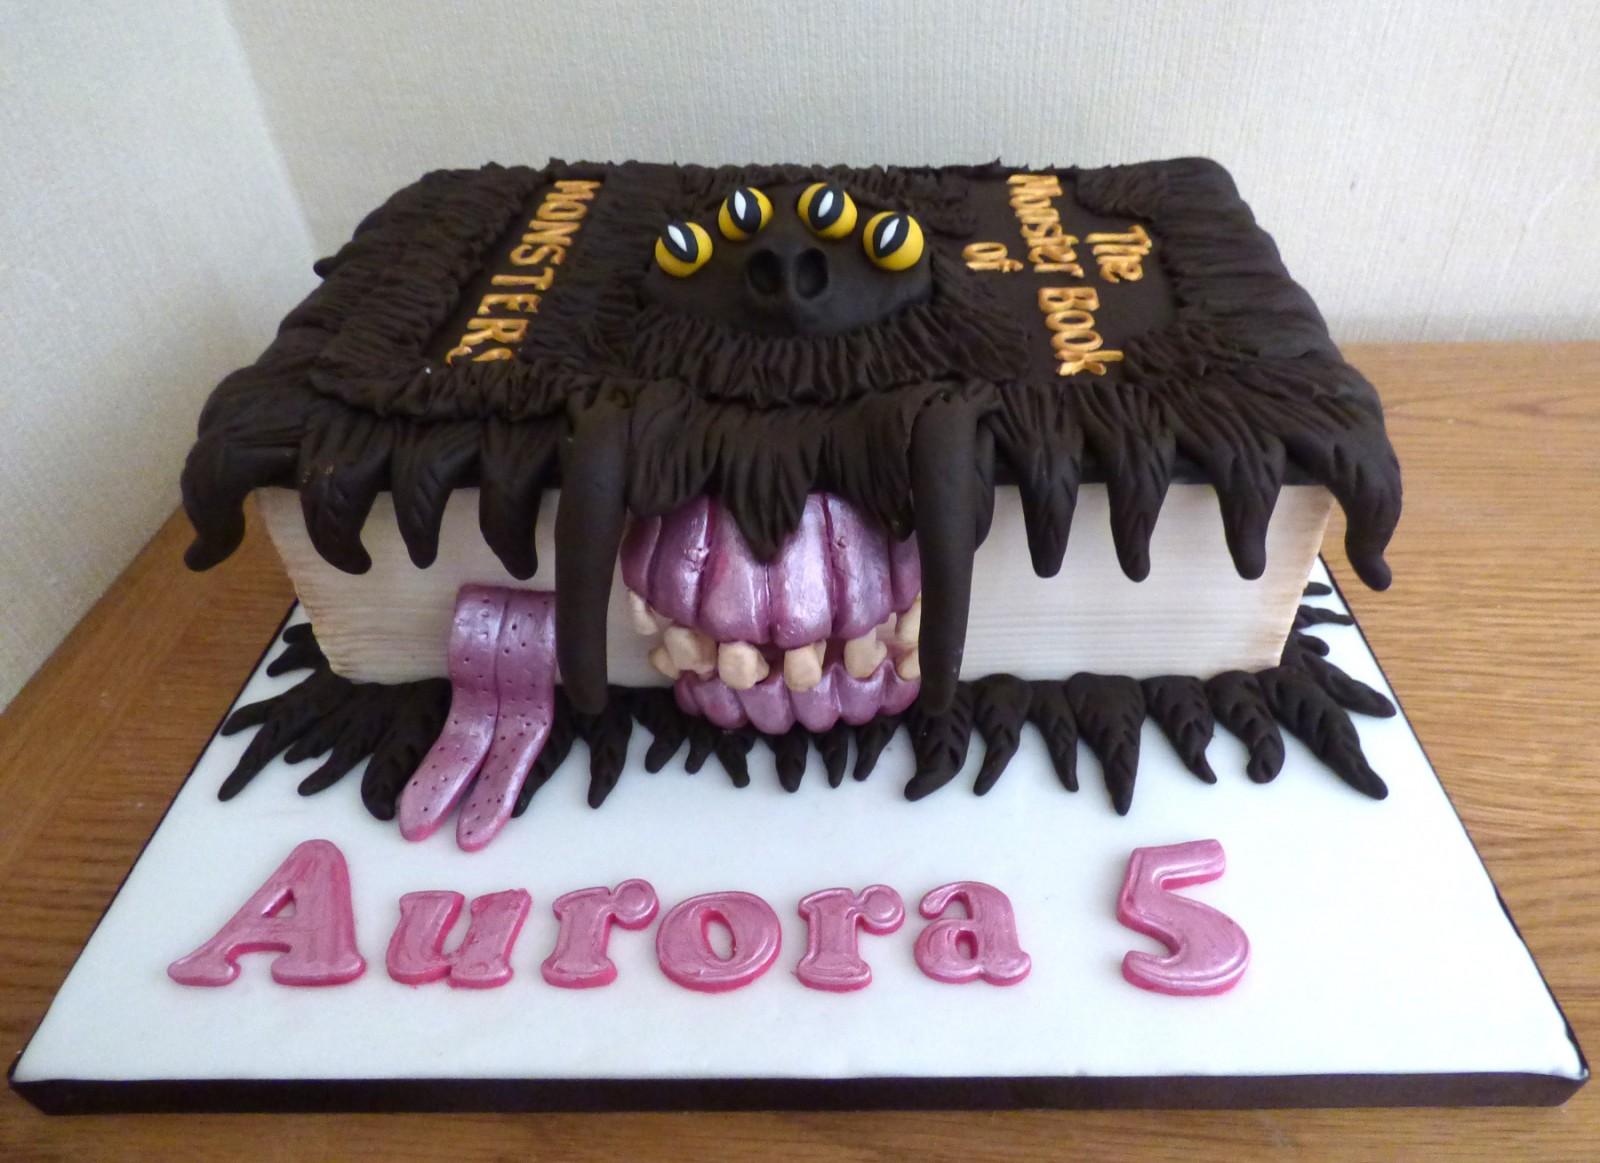 Terrific Harry Potter Monster Book Of Monsters Birthday Cake Susies Cakes Personalised Birthday Cards Arneslily Jamesorg